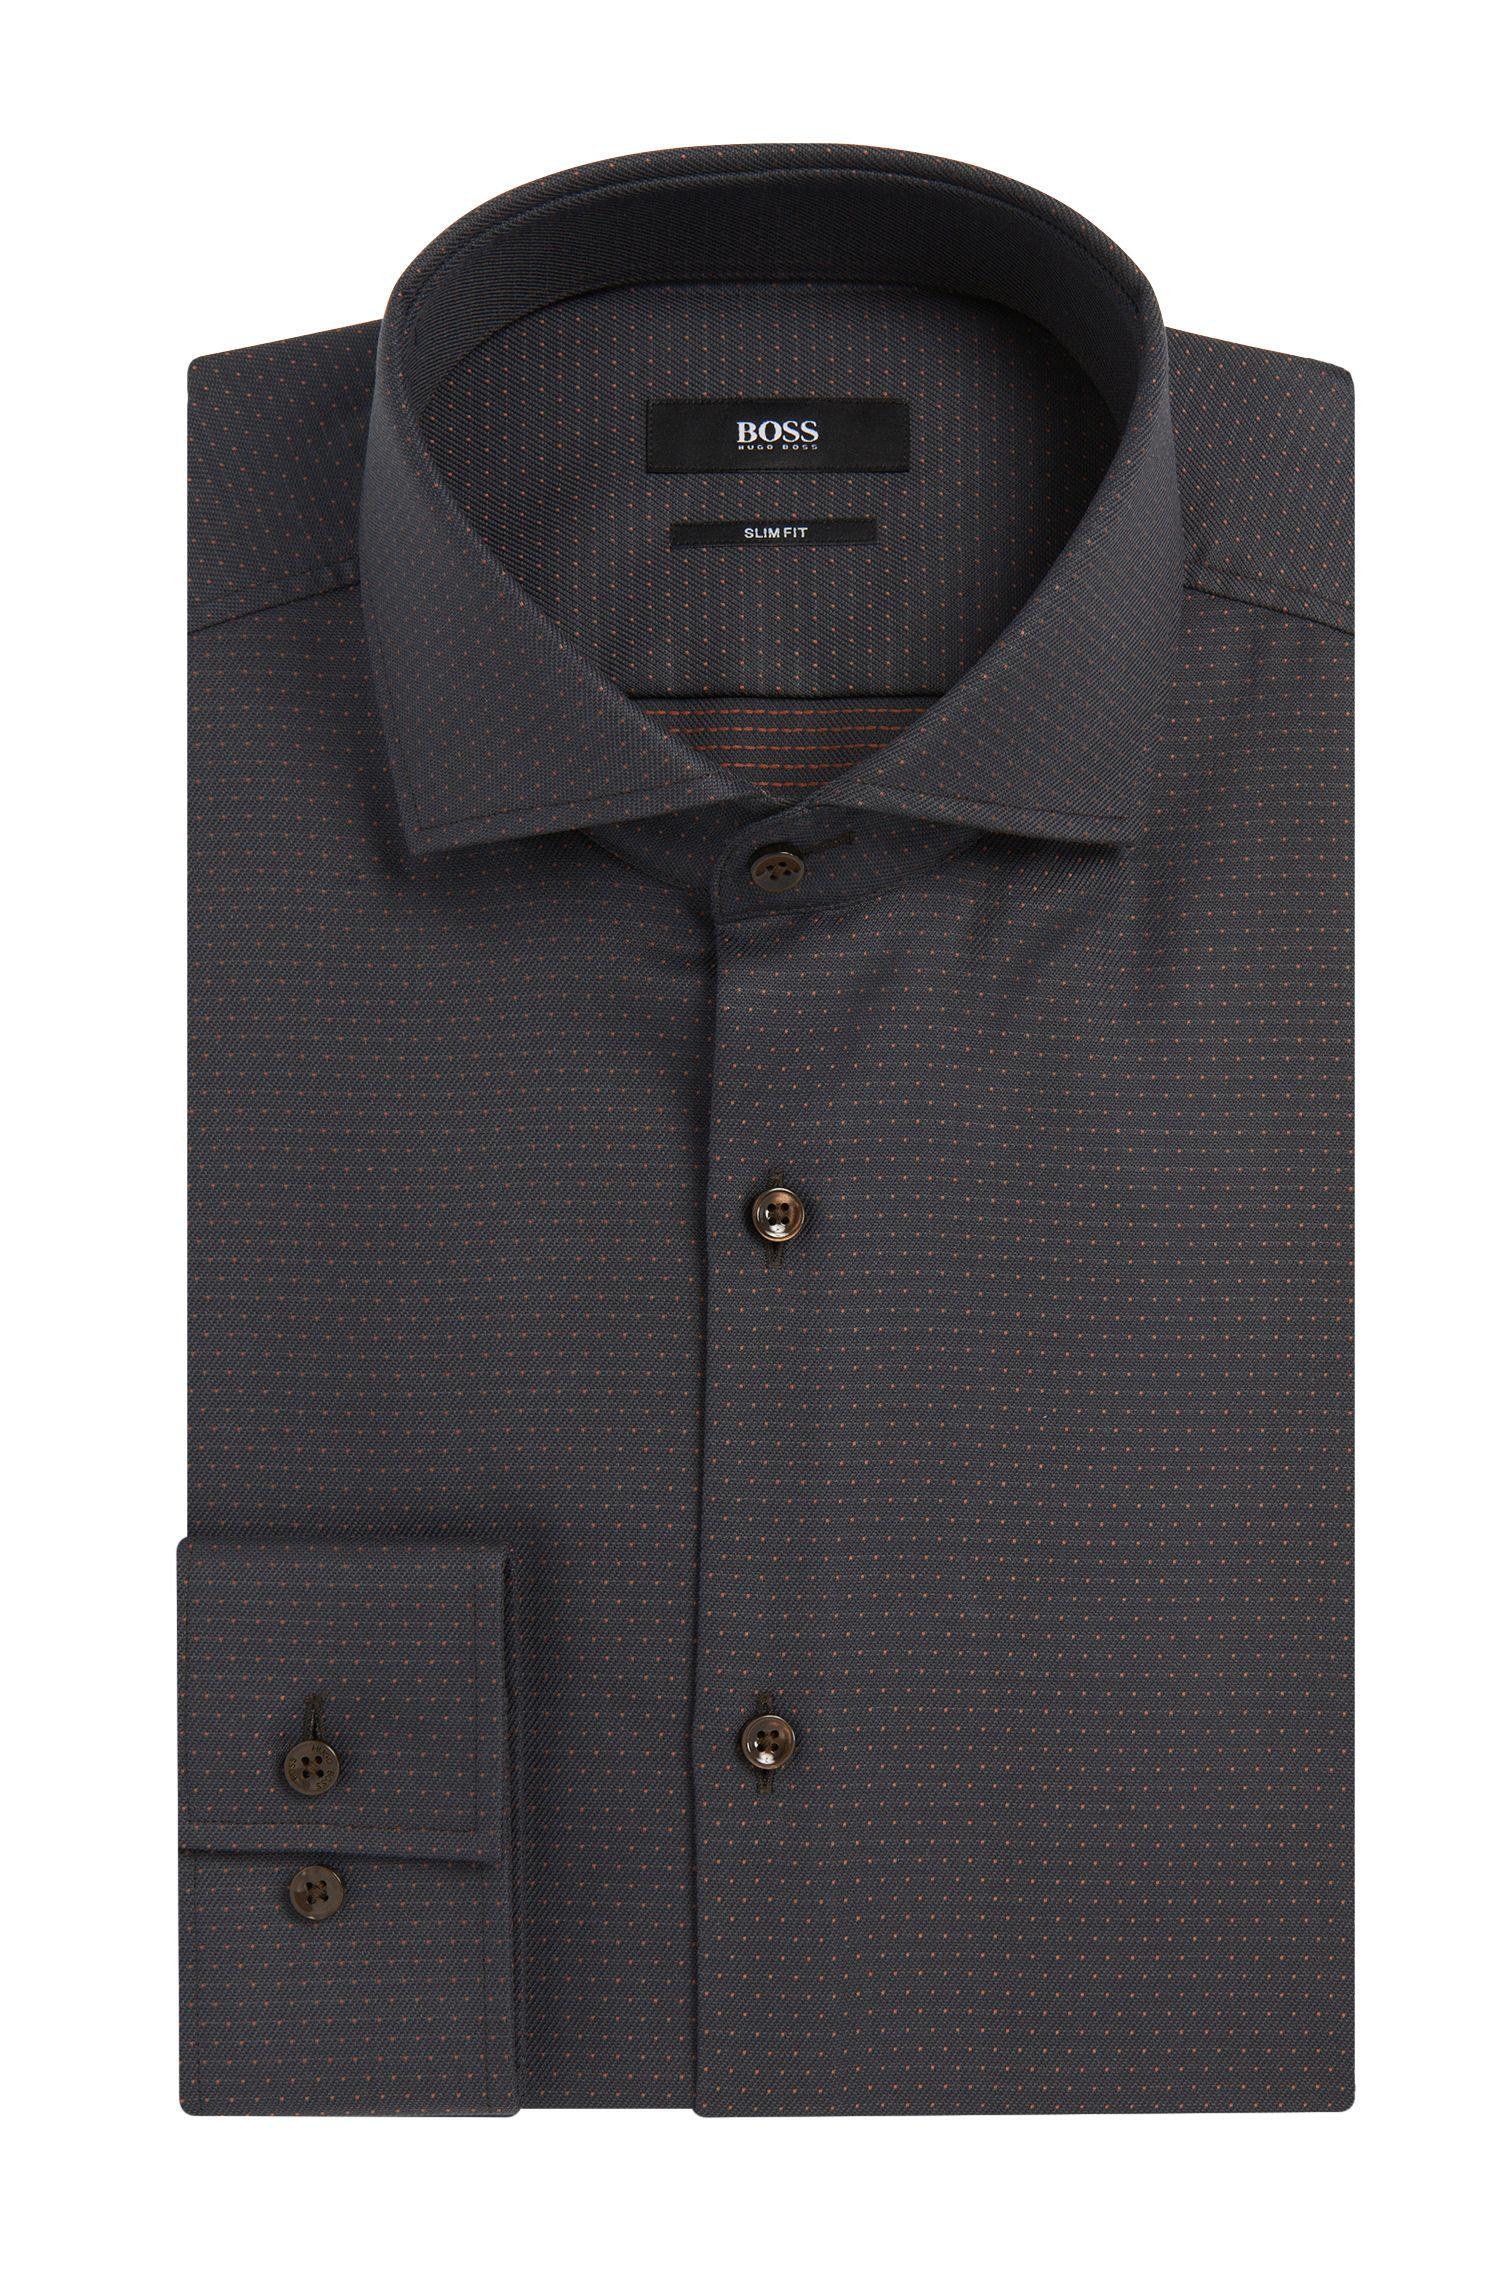 'Jason' | Slim Fit, Cotton Patterned Dress Shirt